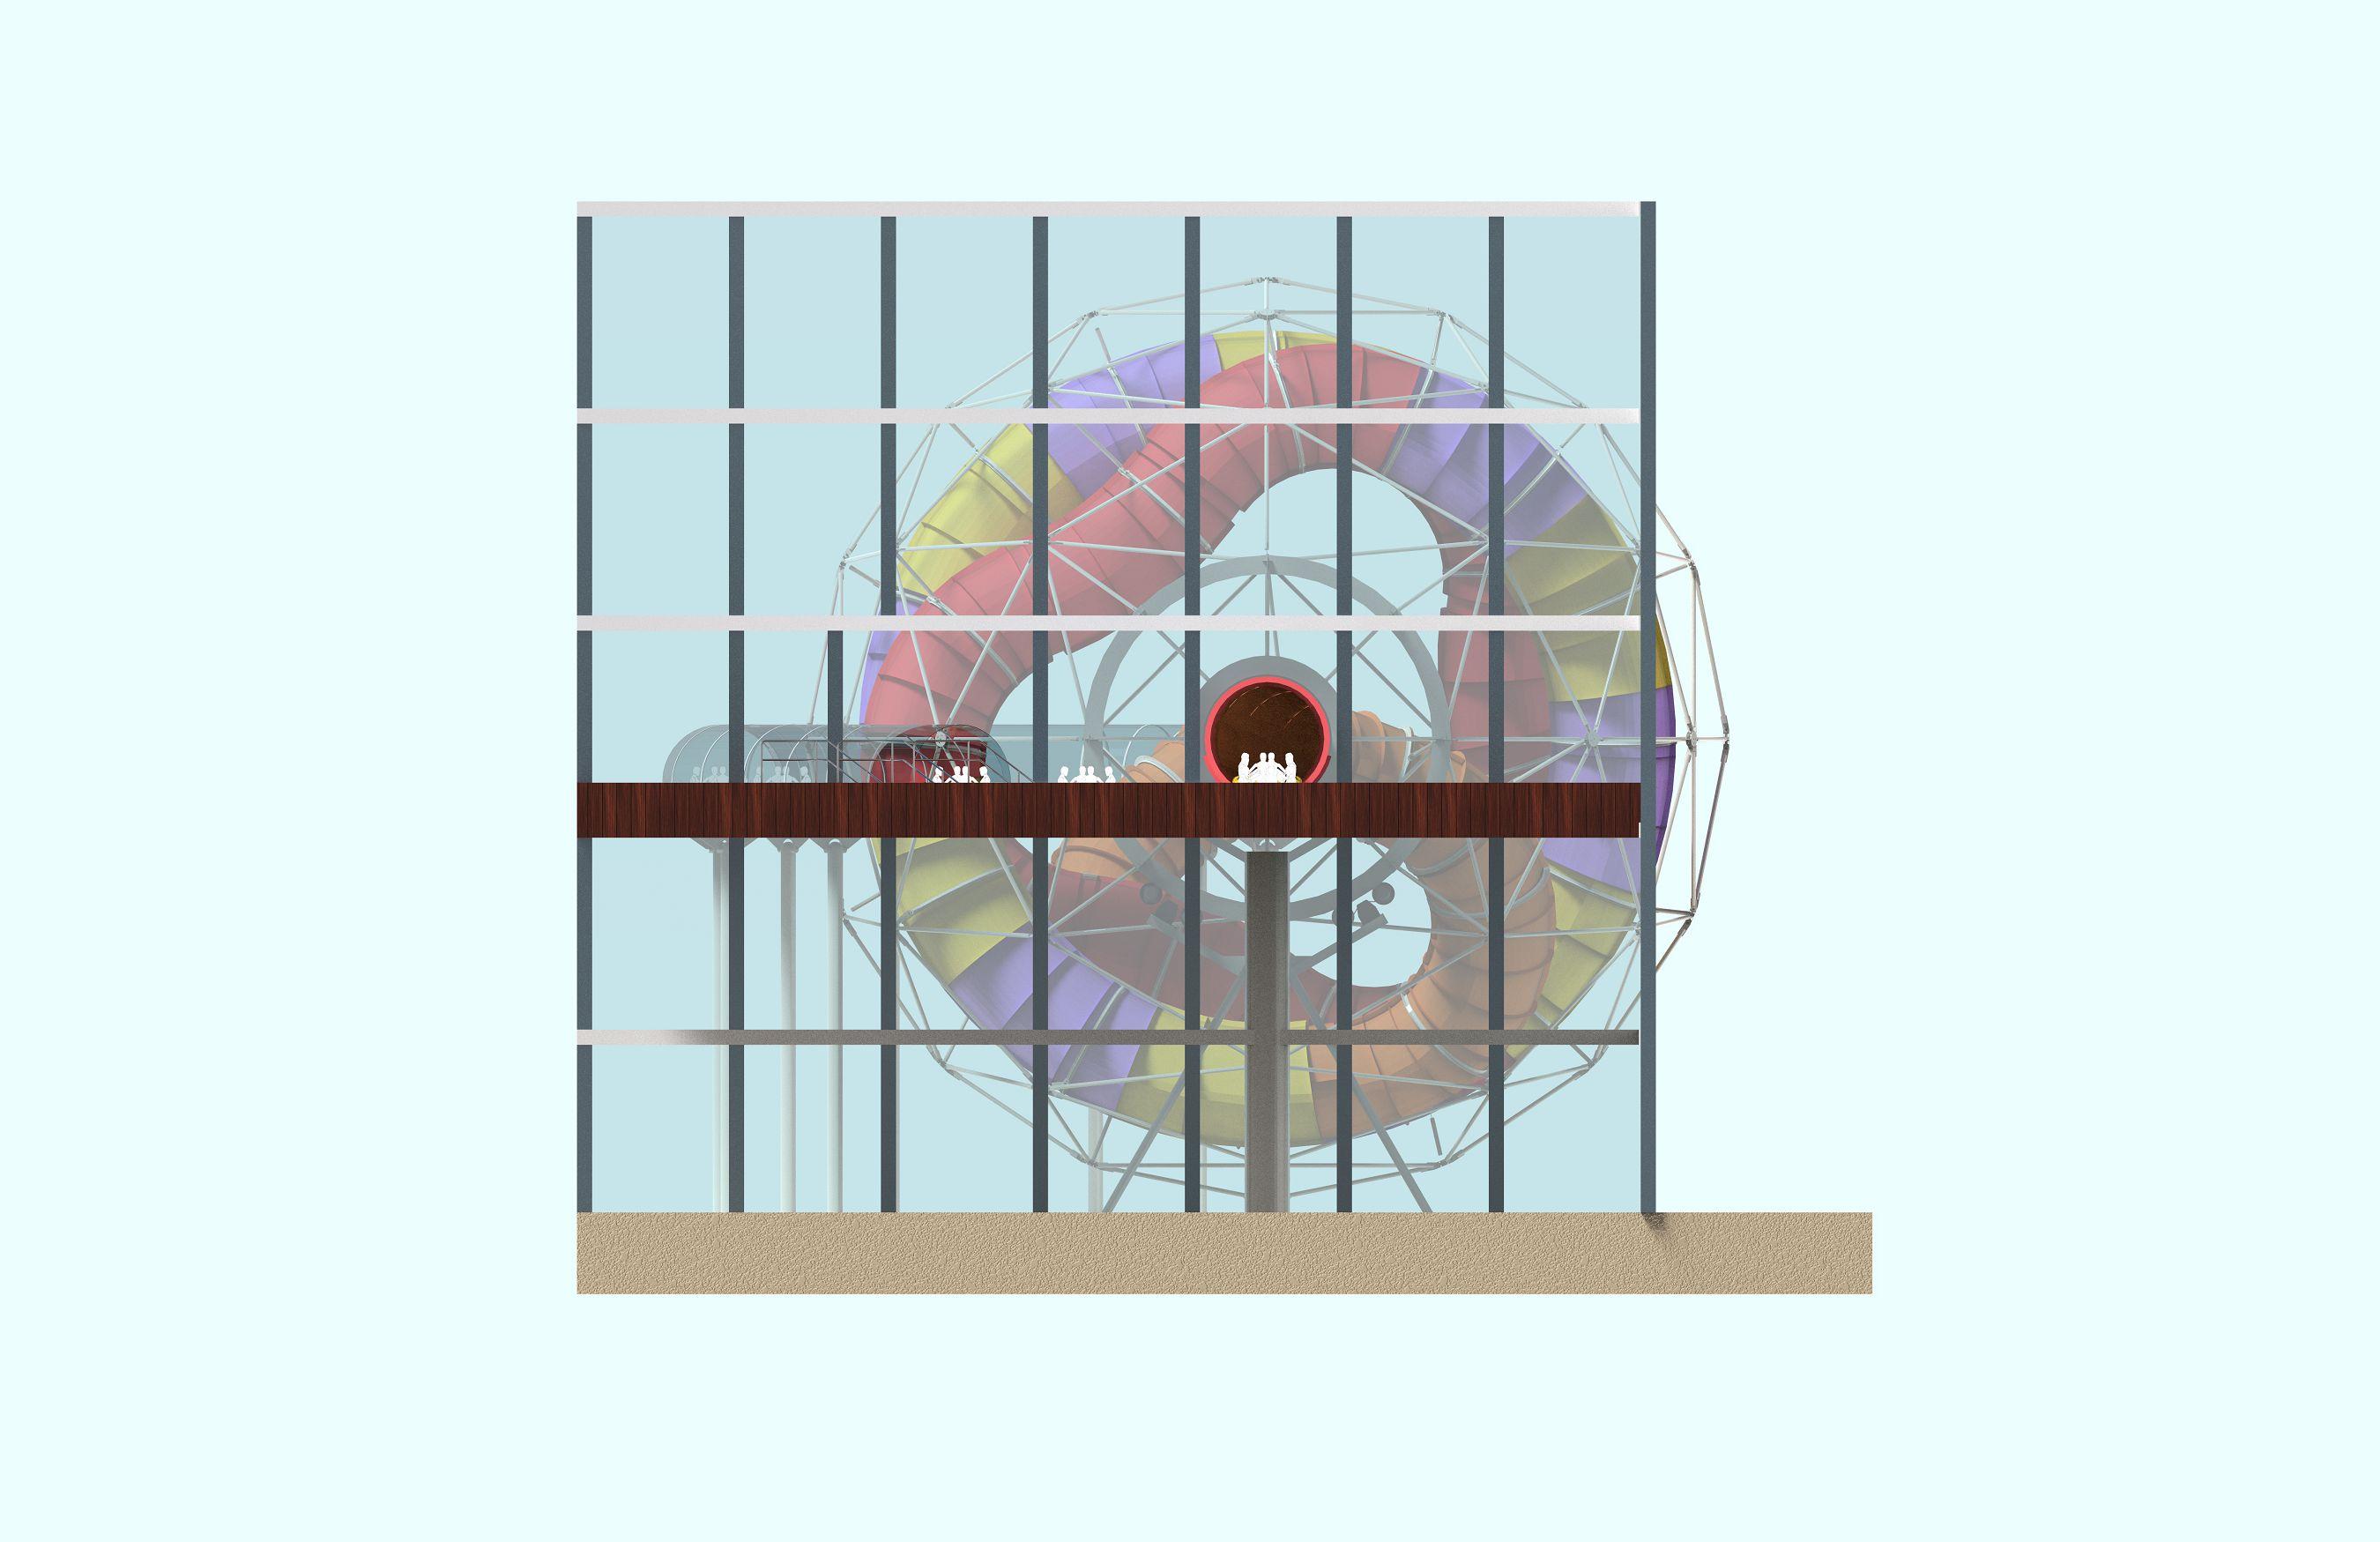 Arkimedes_ESCENA-fachada.34